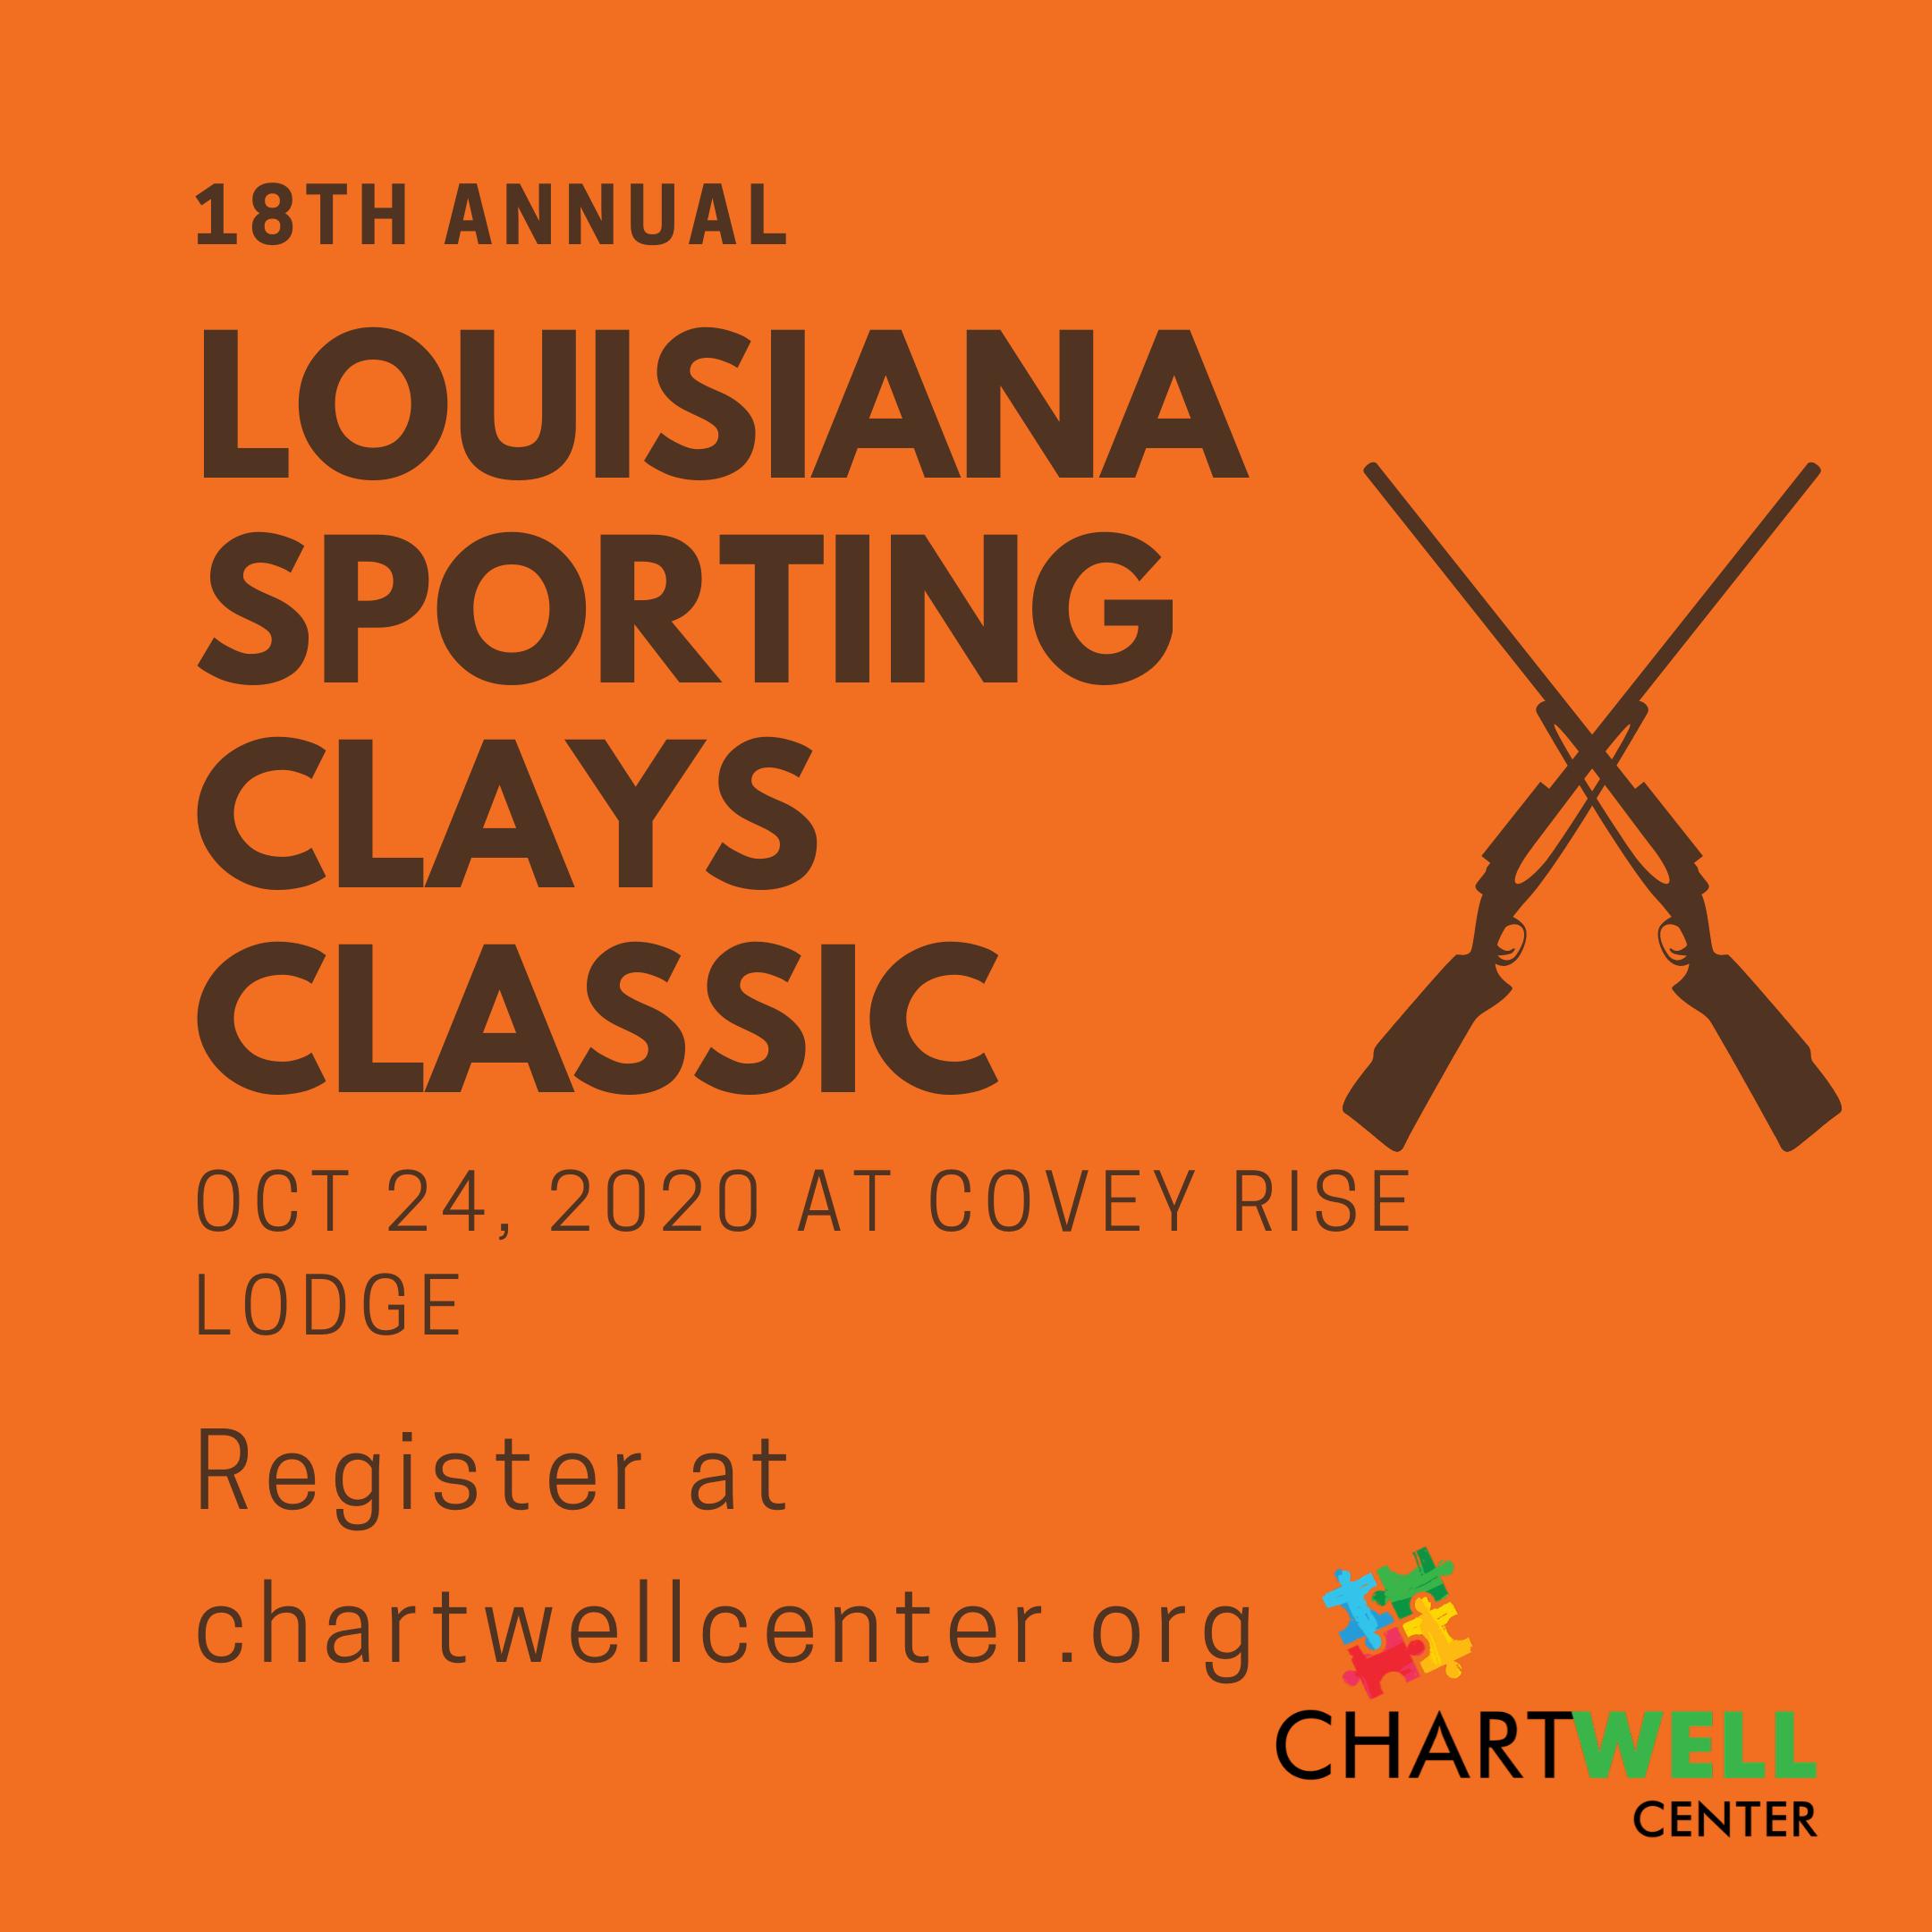 Louisiana Sporting Clays Classic